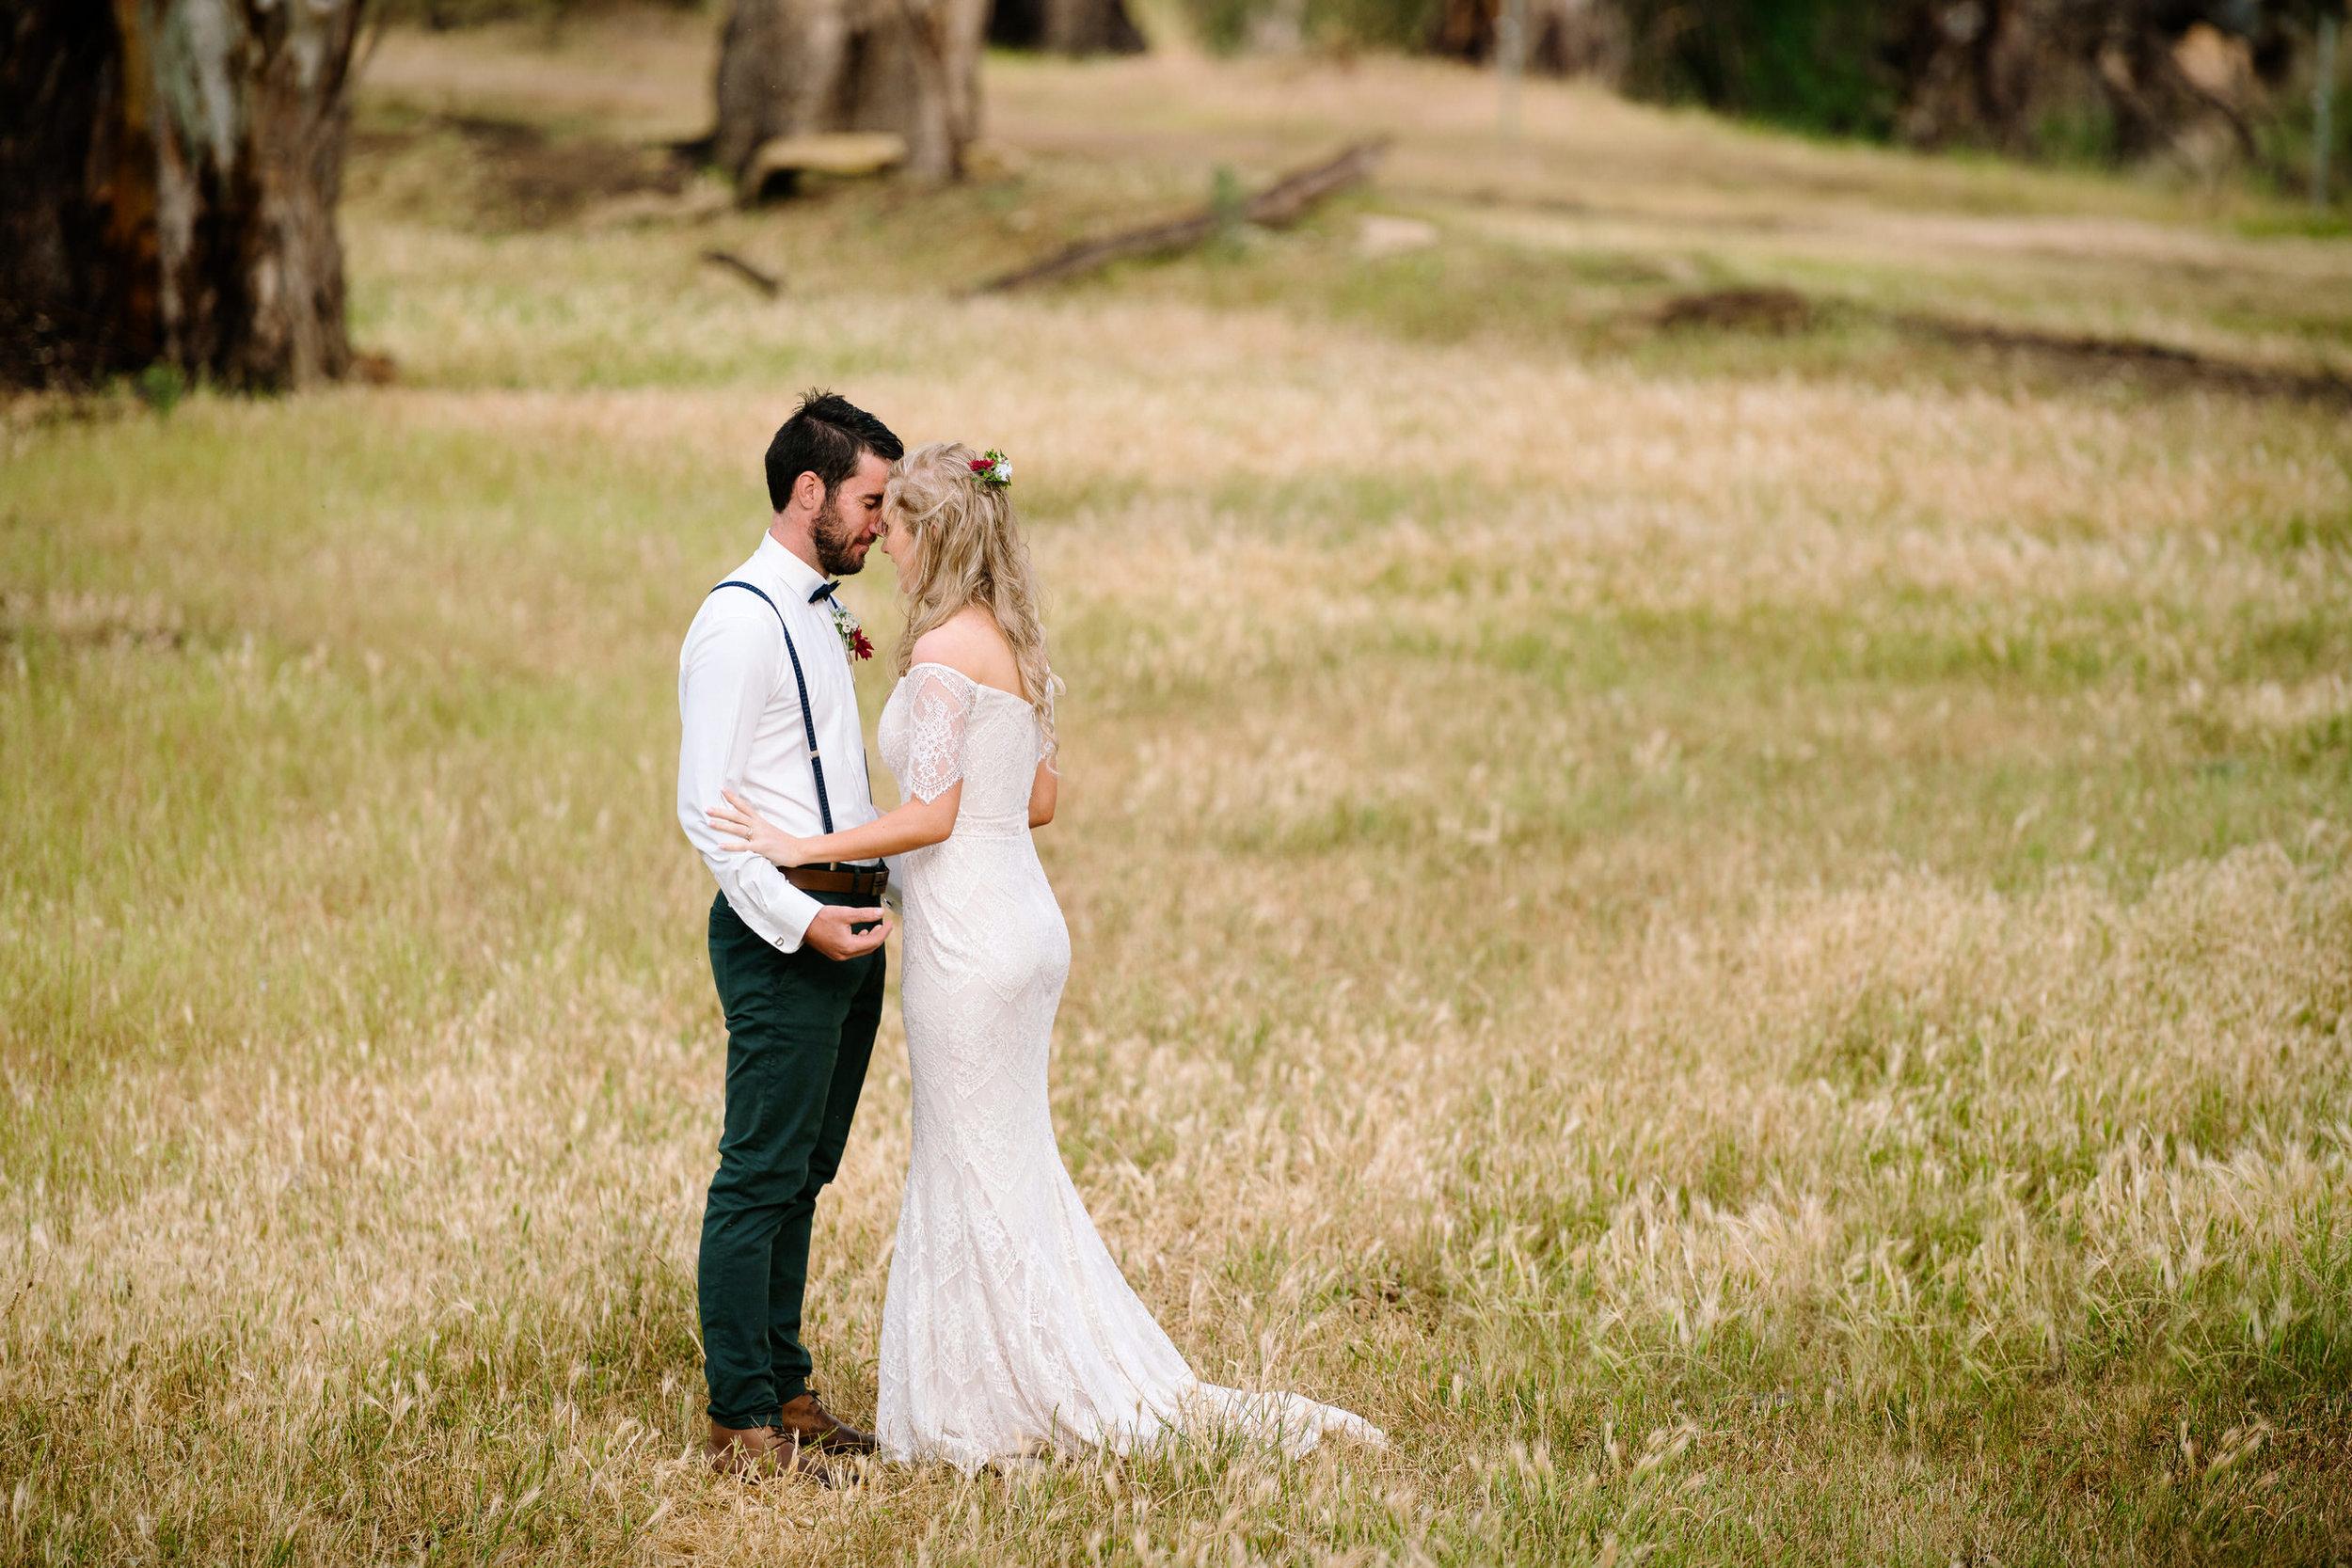 Justin_And_Jim_Photography_Backyard_Wedding202.JPG